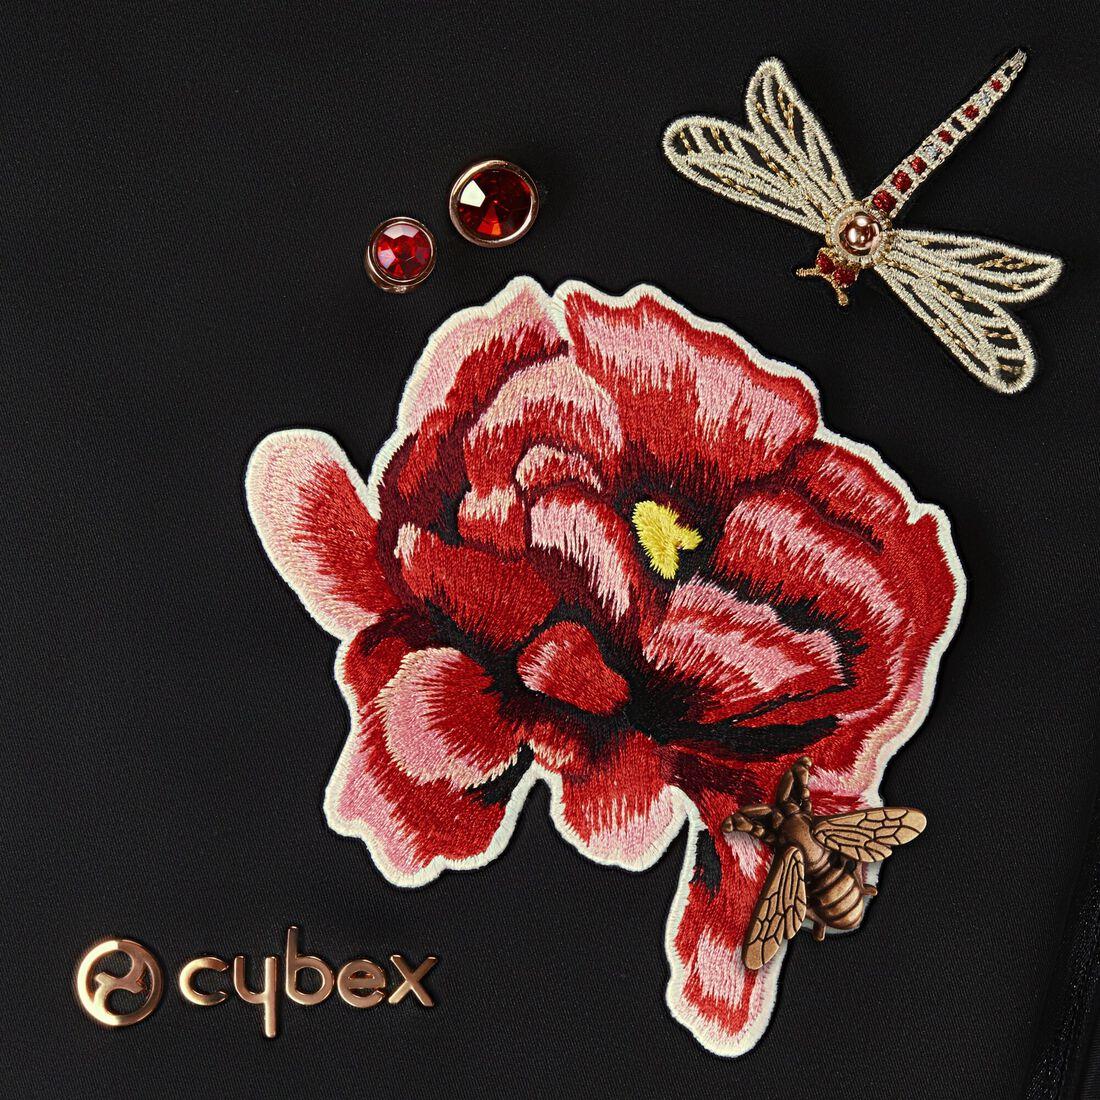 CYBEX Platinum Footmuff - Spring Blossom Dark in Spring Blossom Dark large image number 3